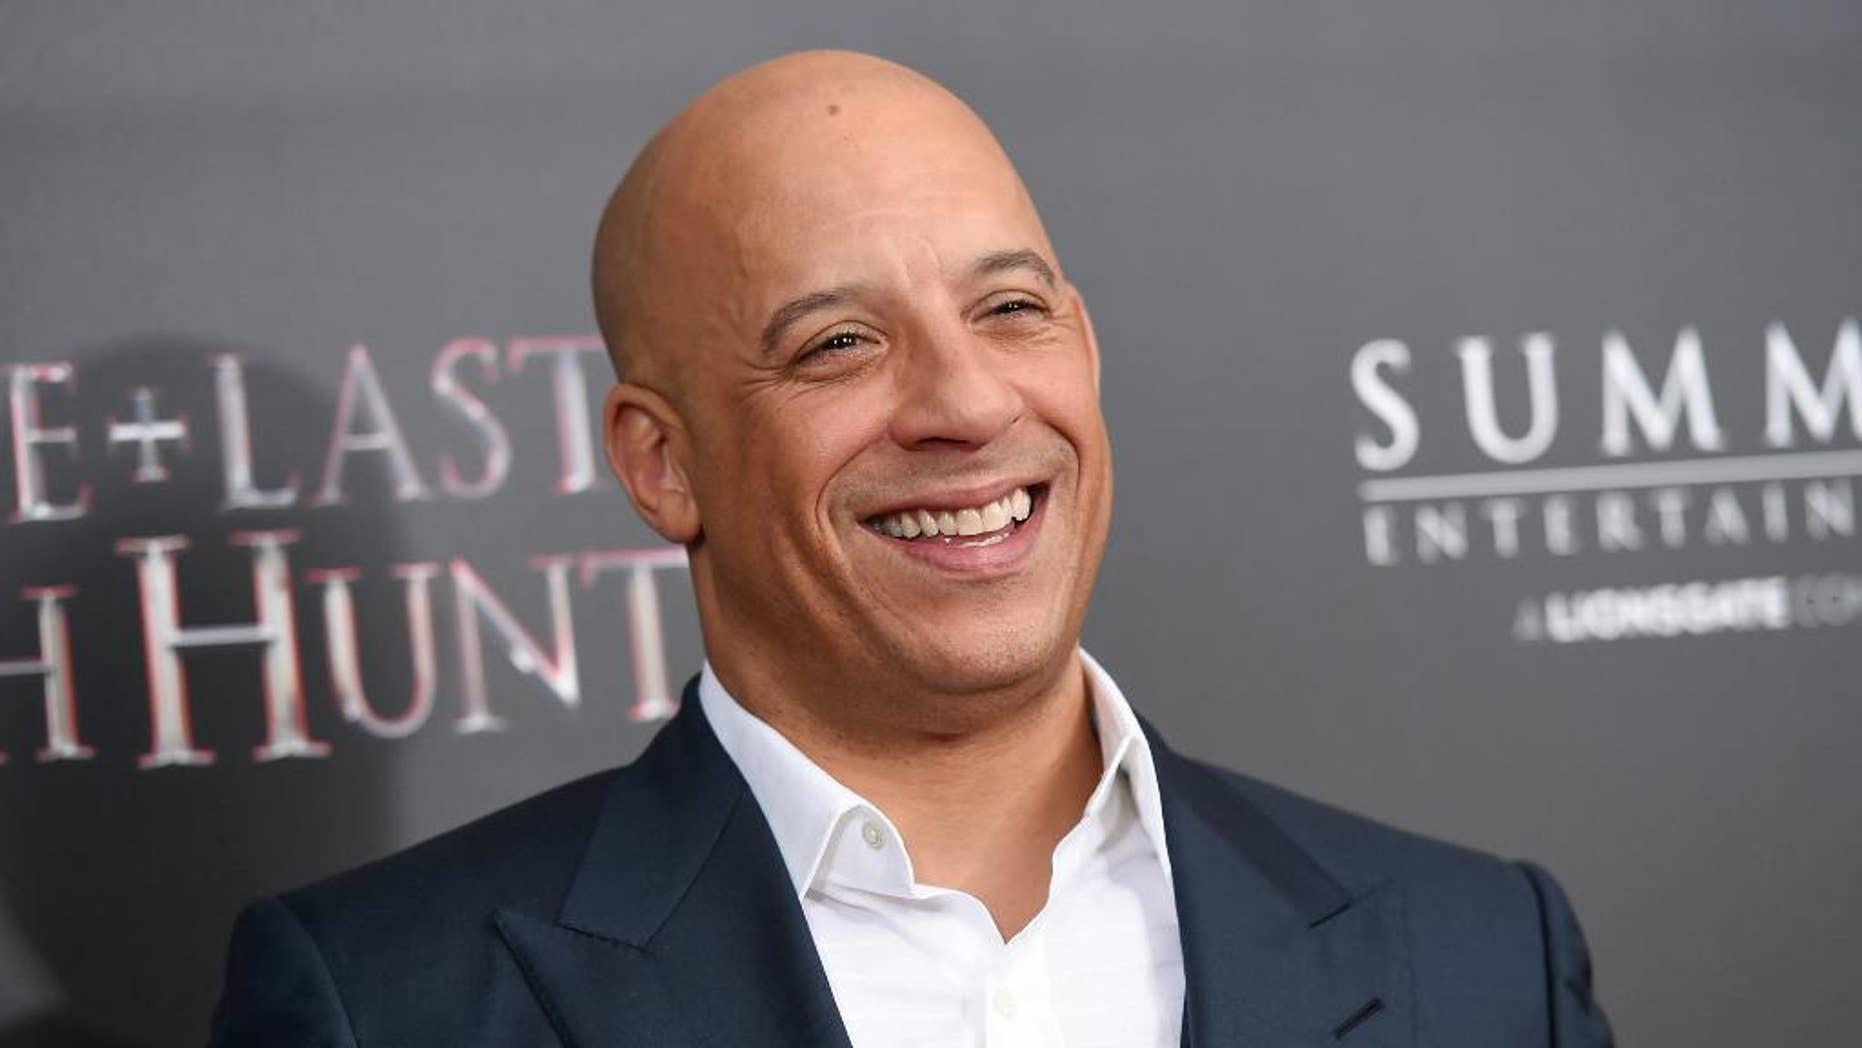 Vin Diesel at a premiere in New York.